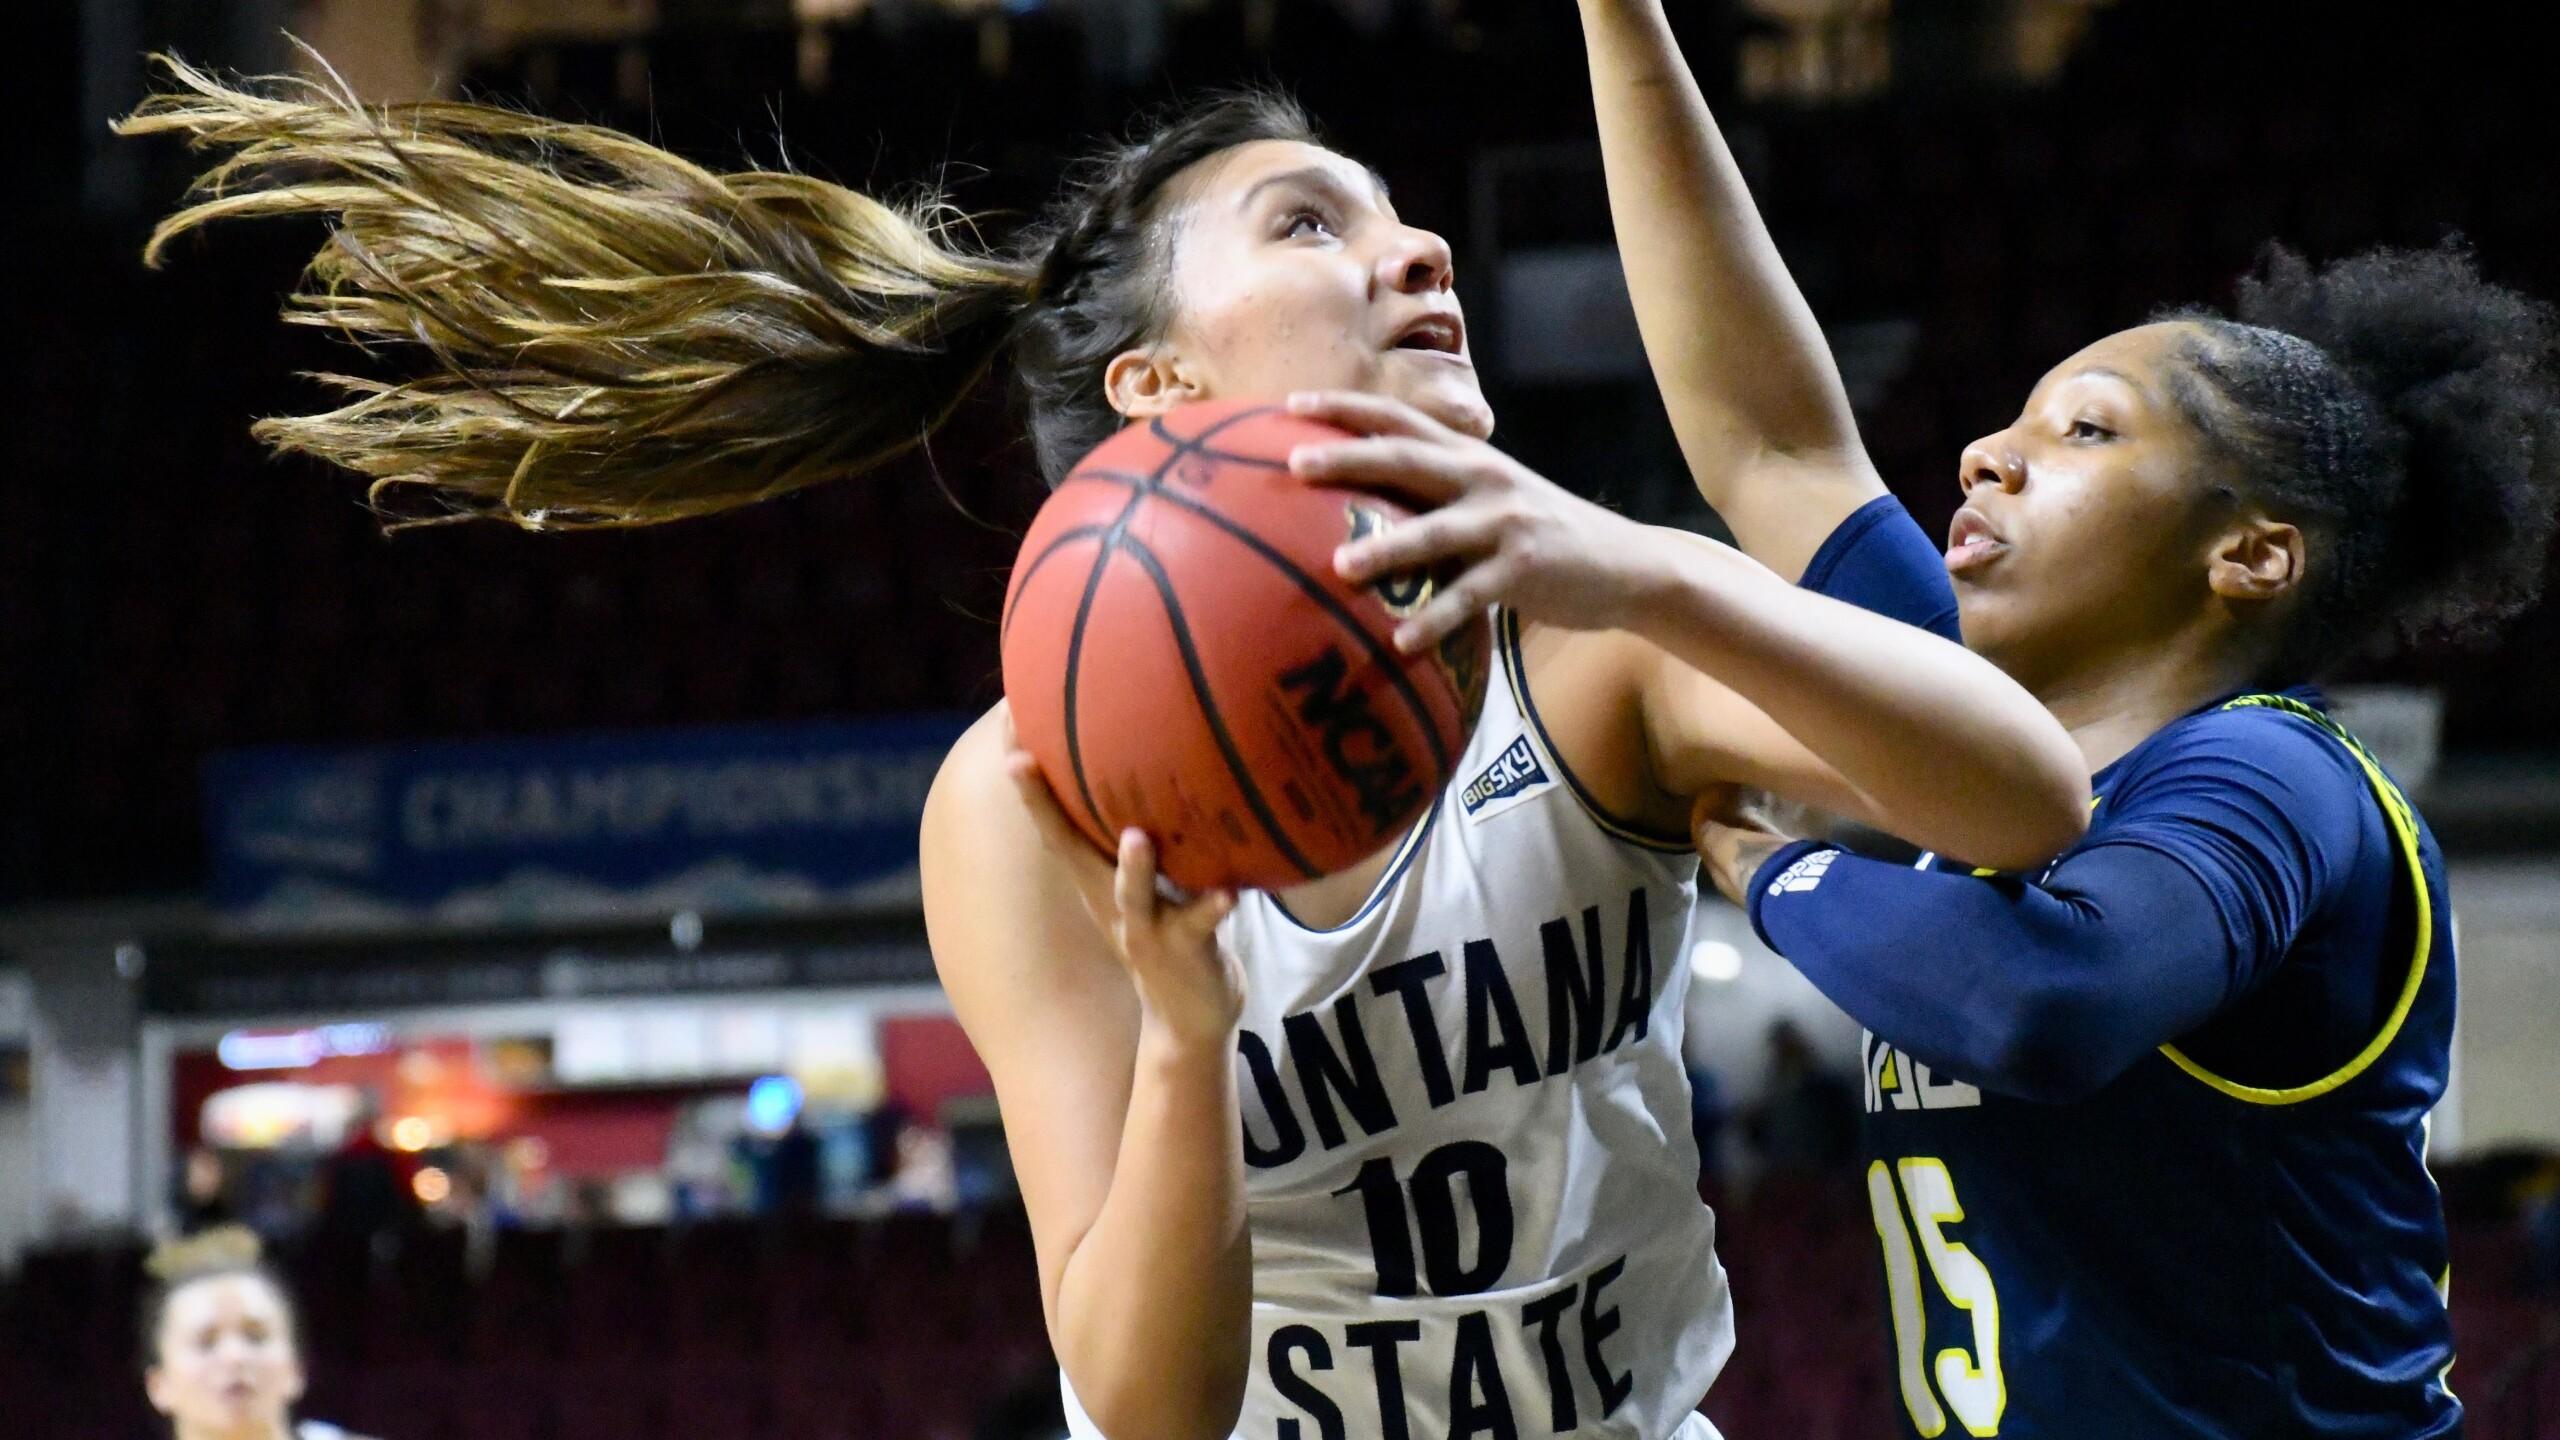 Montana State Bobcats vs. Northern Arizona Lumberjacks - Big Sky Conference women's basketball semifinal